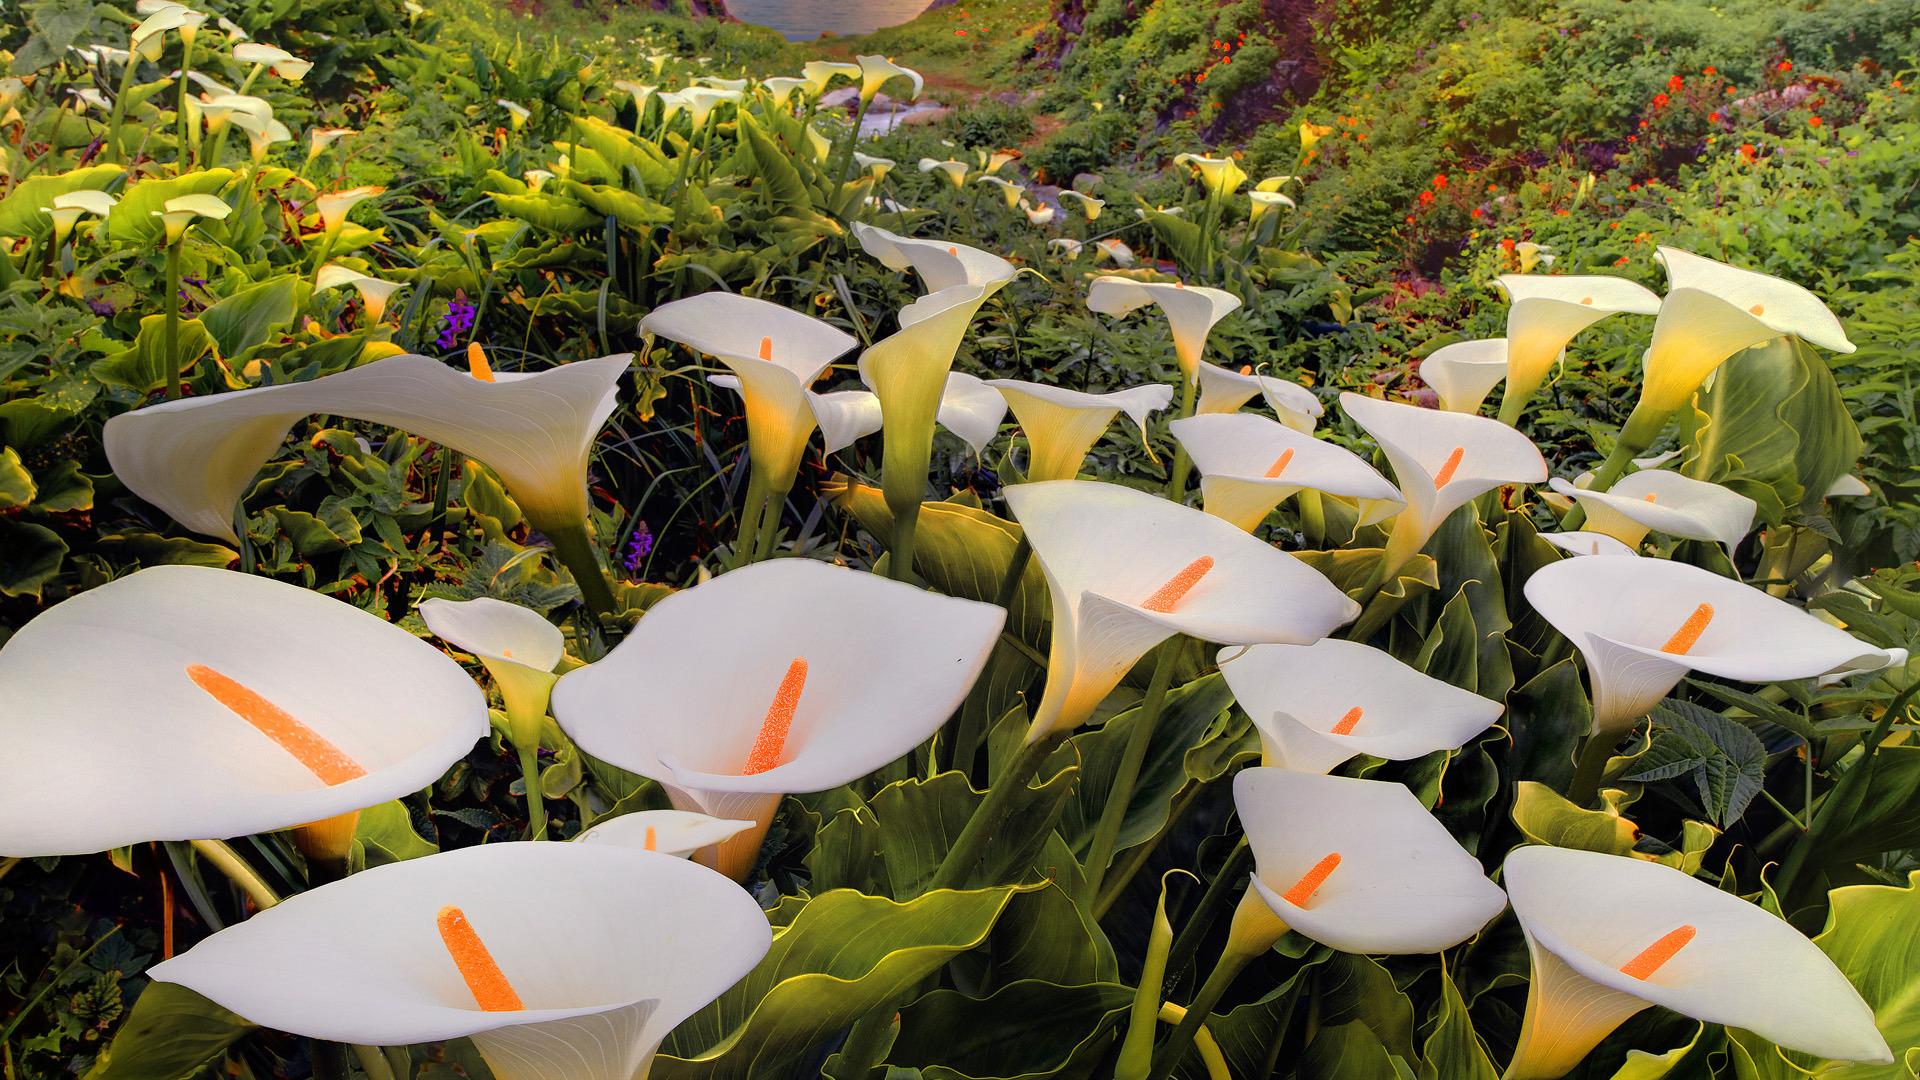 calla lilies image